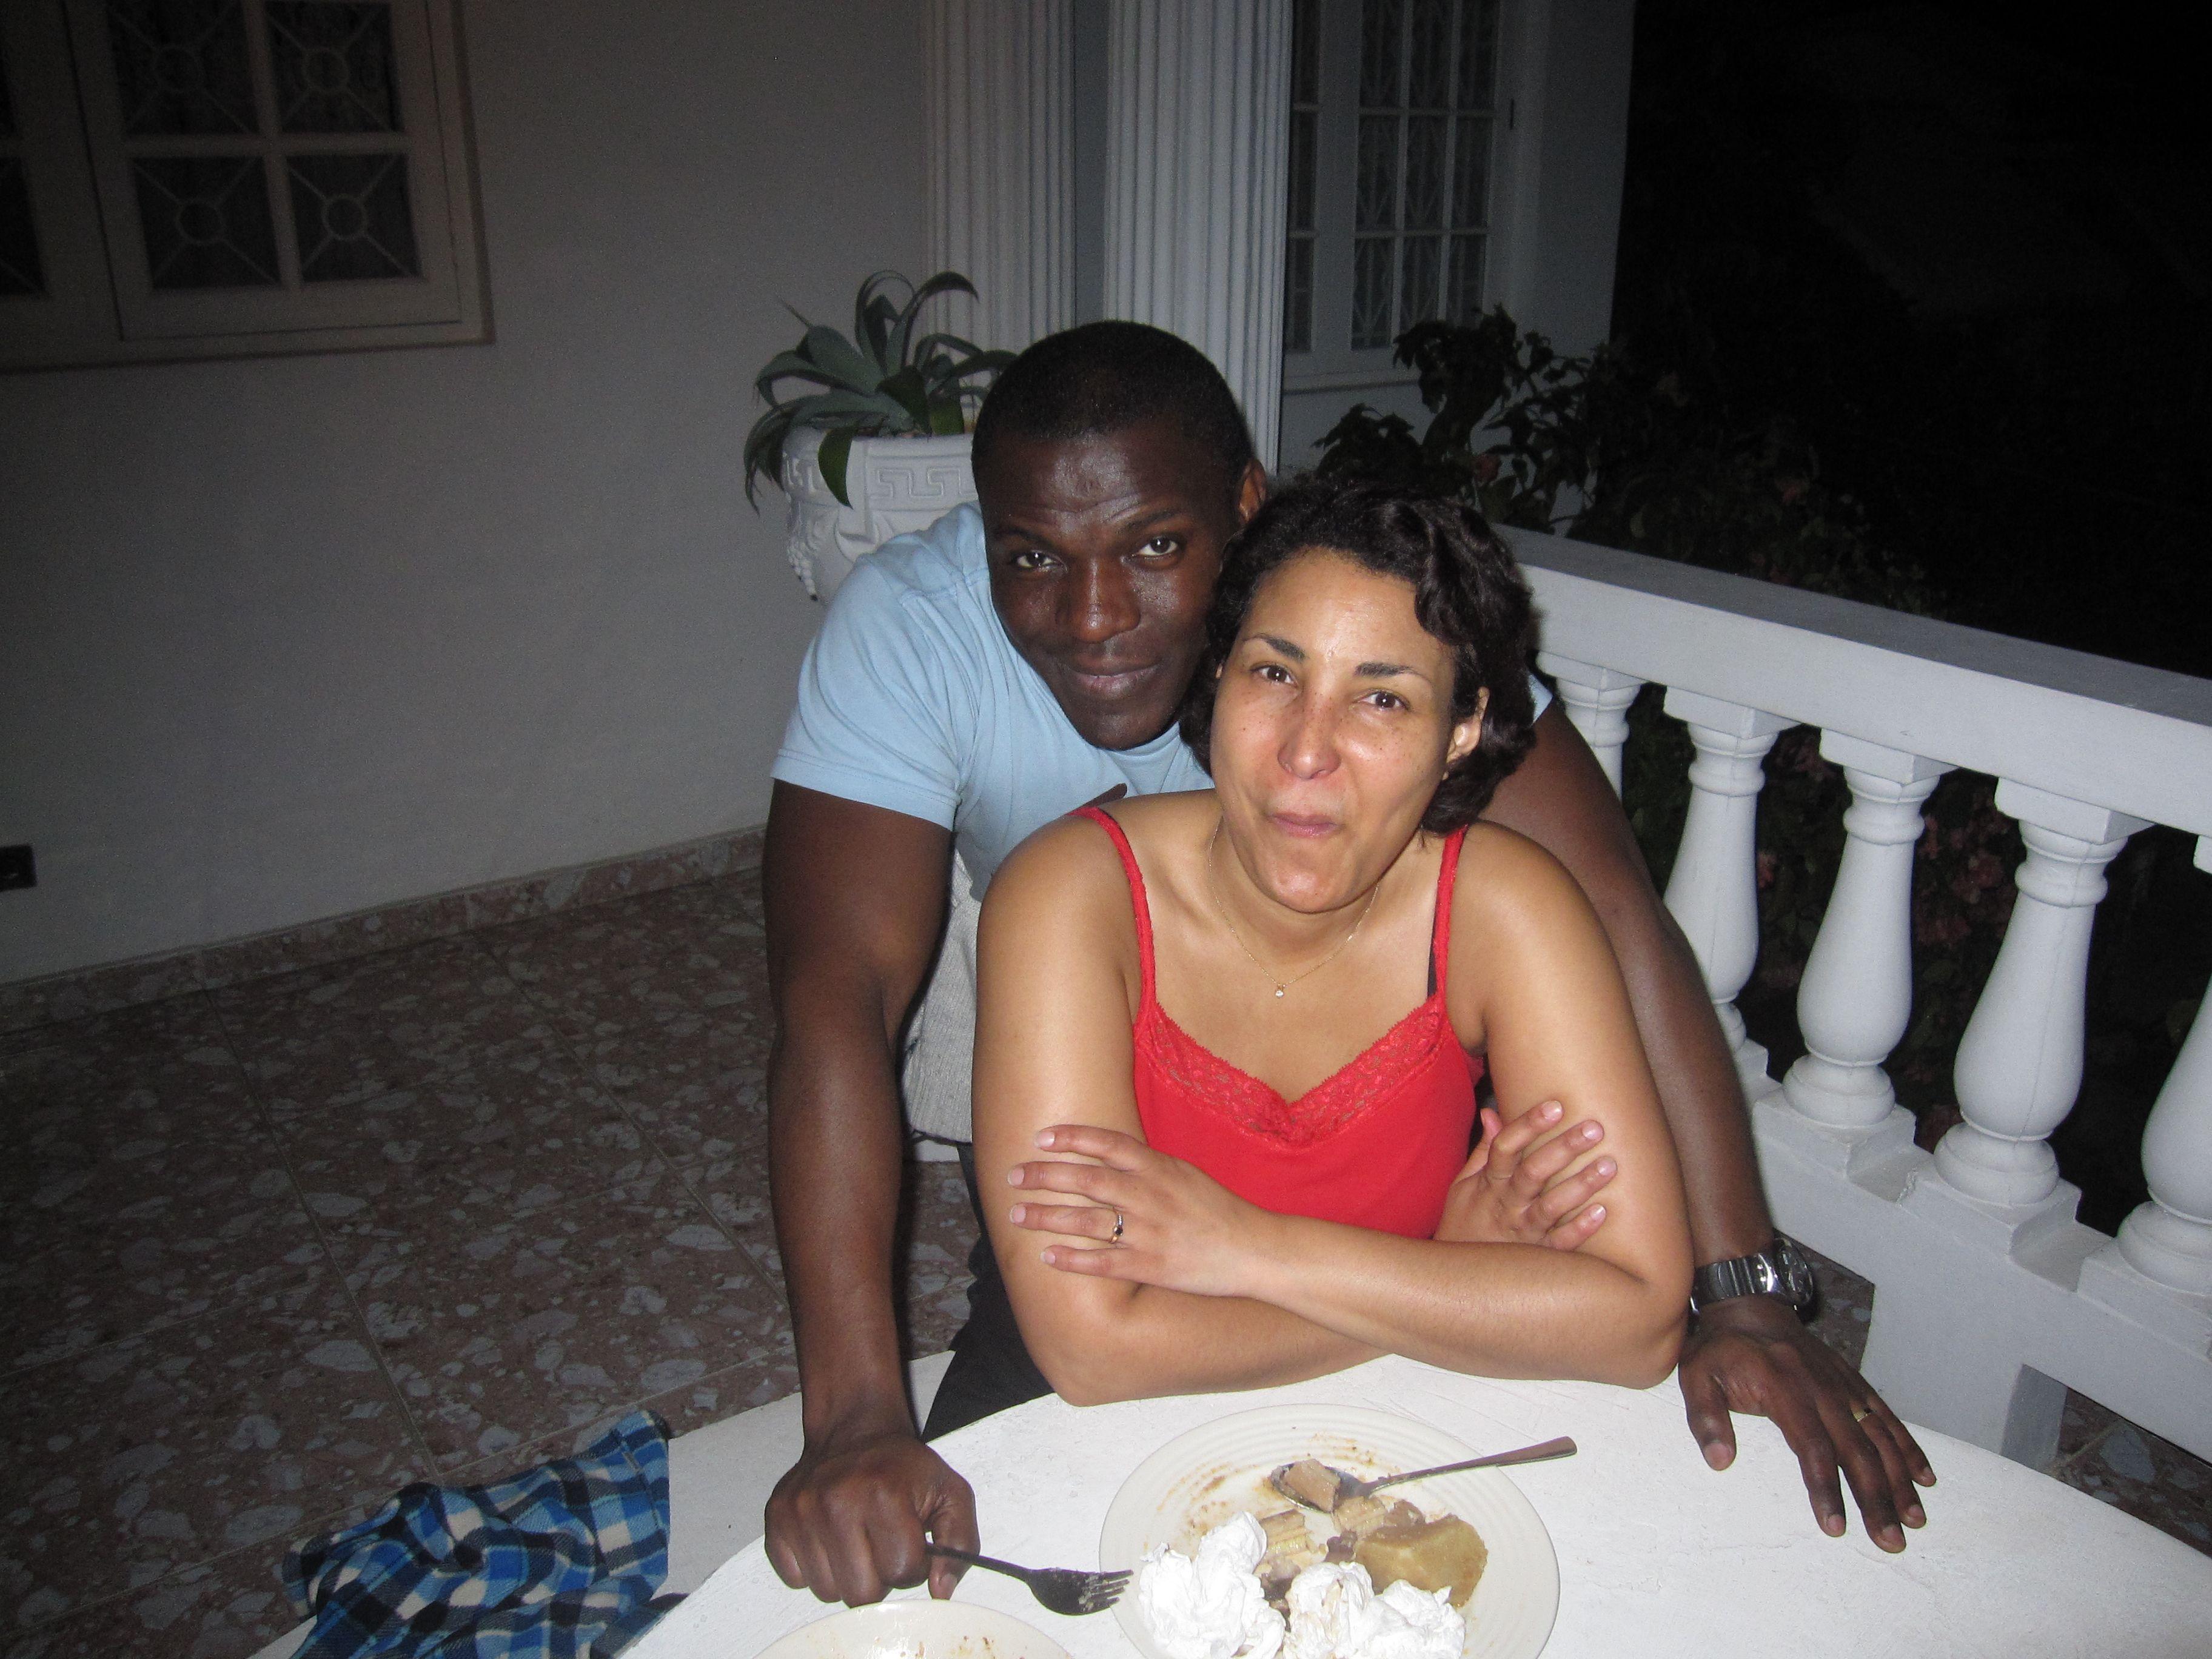 FANTASTIC VILLA NEAR THE HIP STRIP & BEACH IN MONTEGO BAY, JAMAICA  Visit us on http://www.paradisepalmsjamaicavilla.com